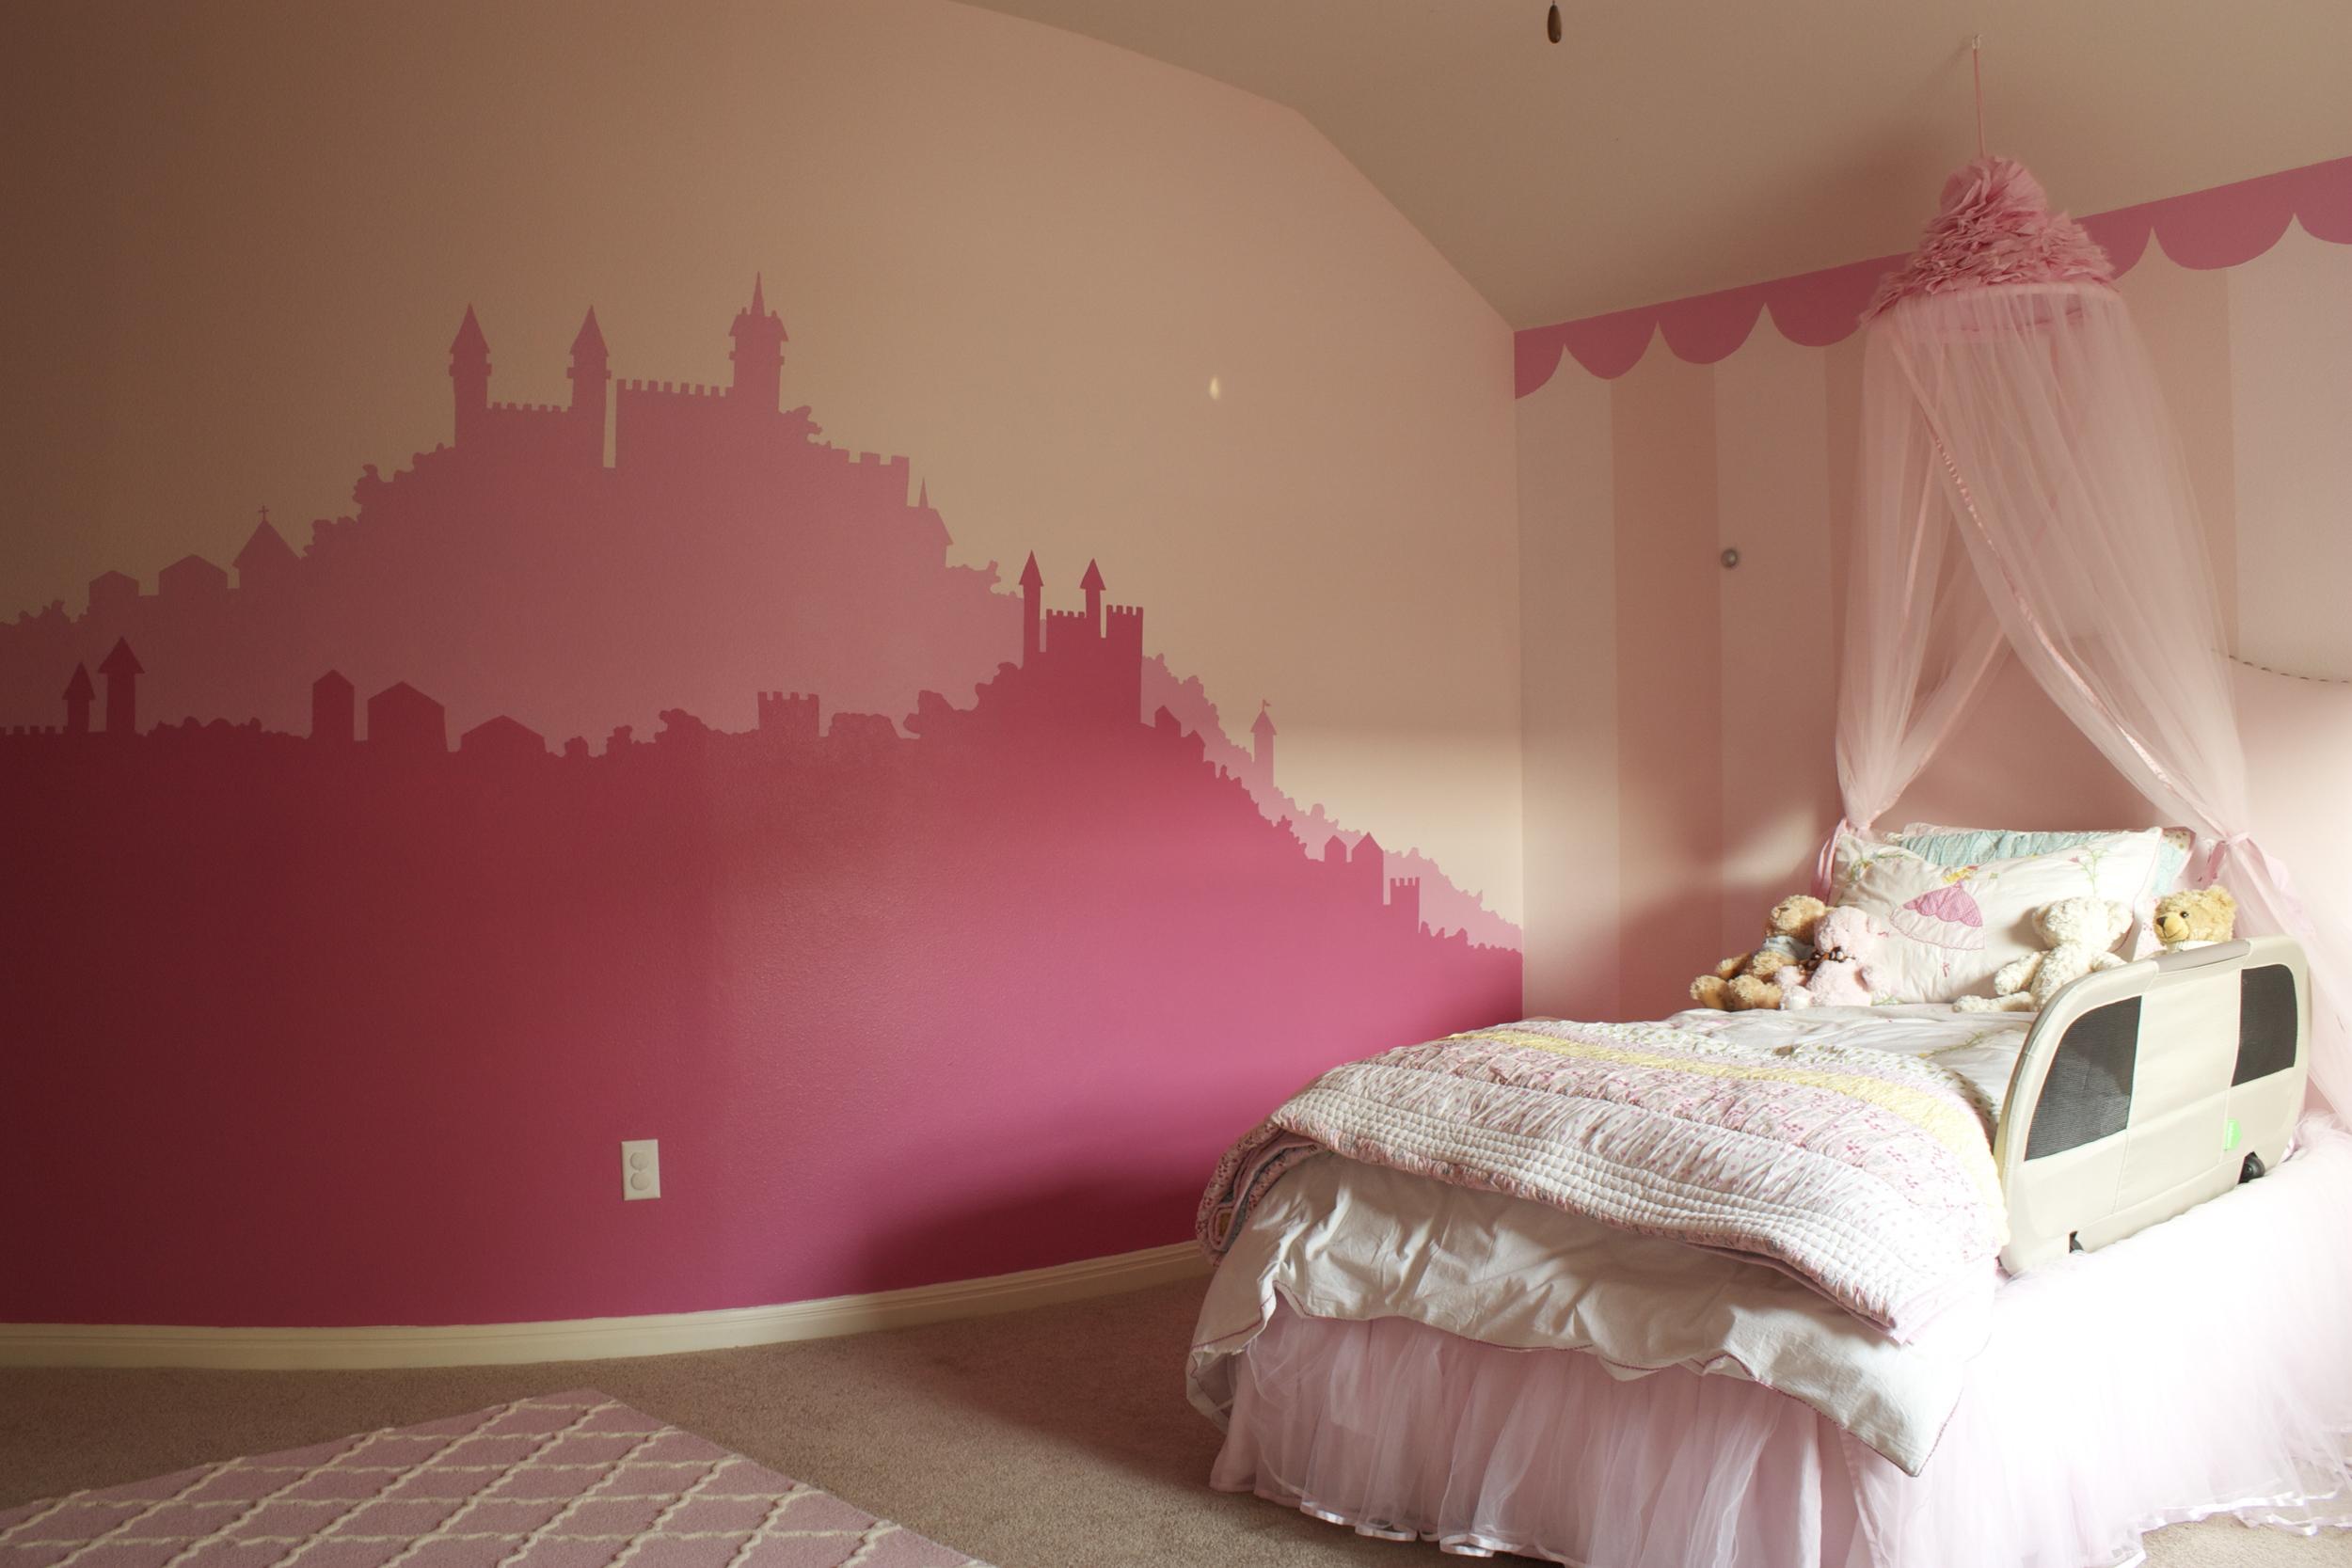 Princess castle toddler bedroom, private residence